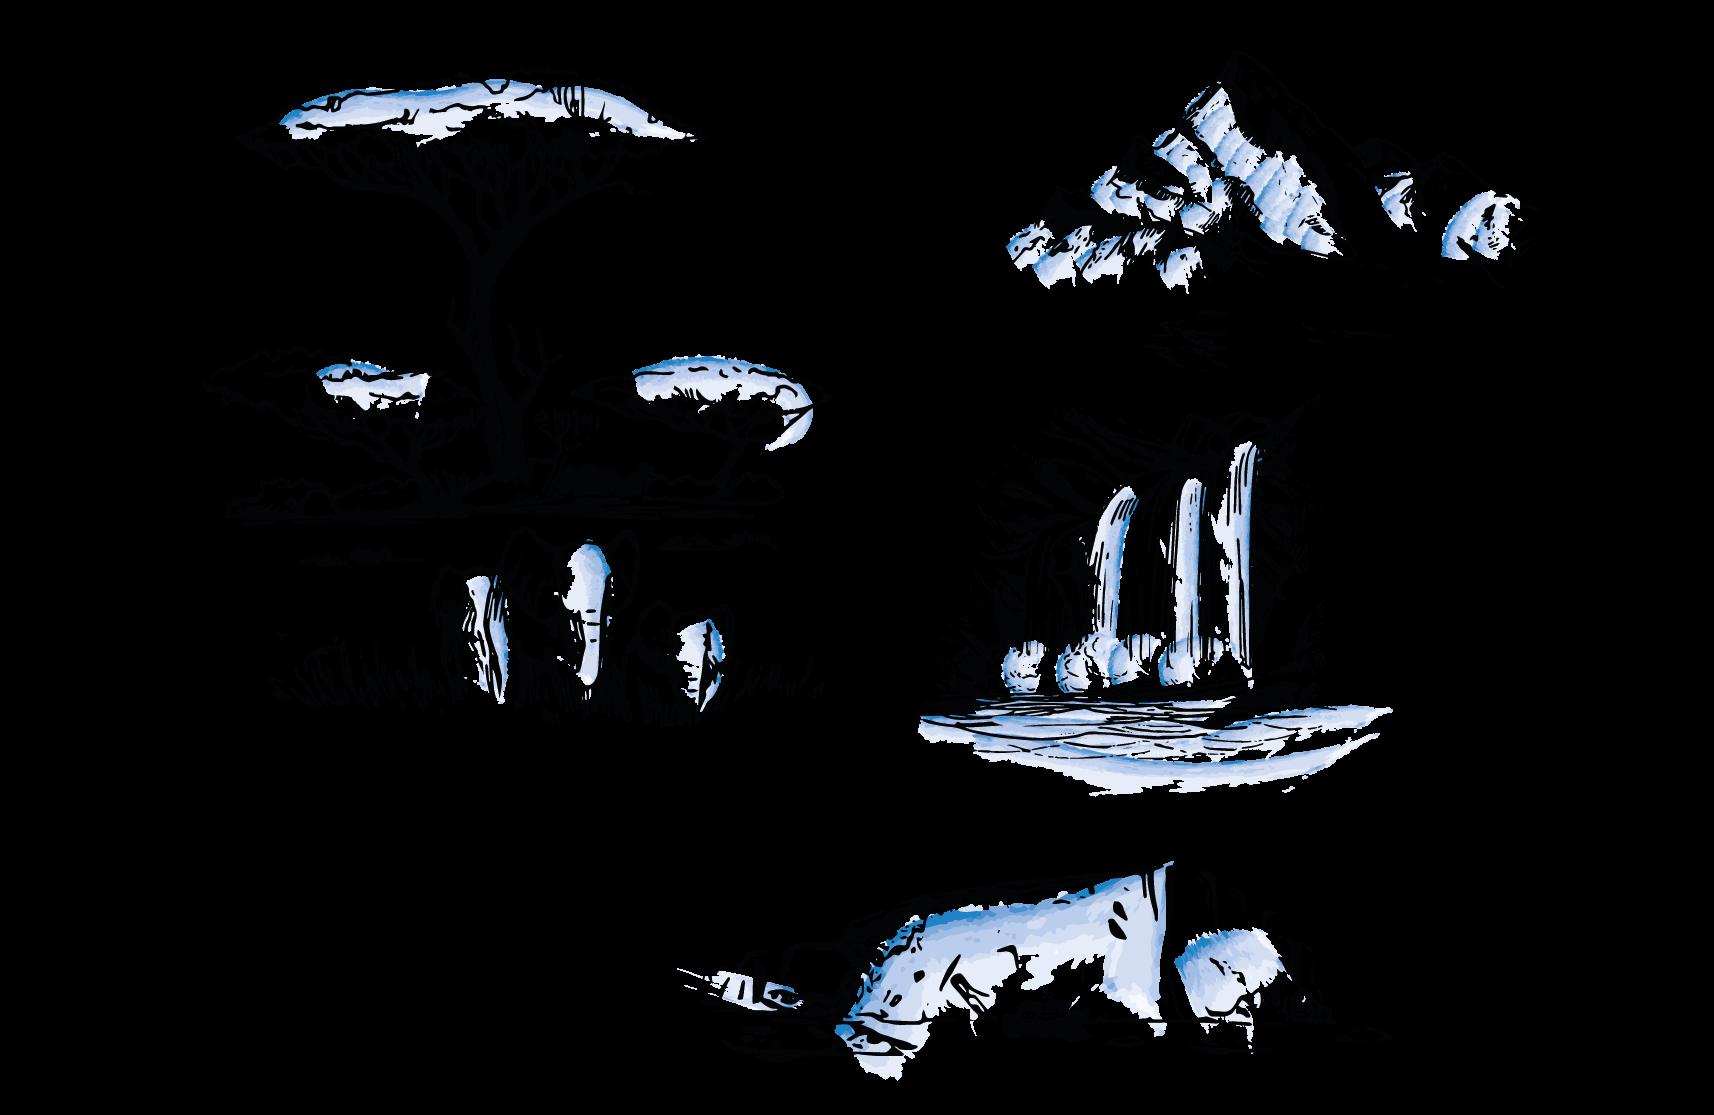 Paisajes únicos | Viajes Planeta Azul